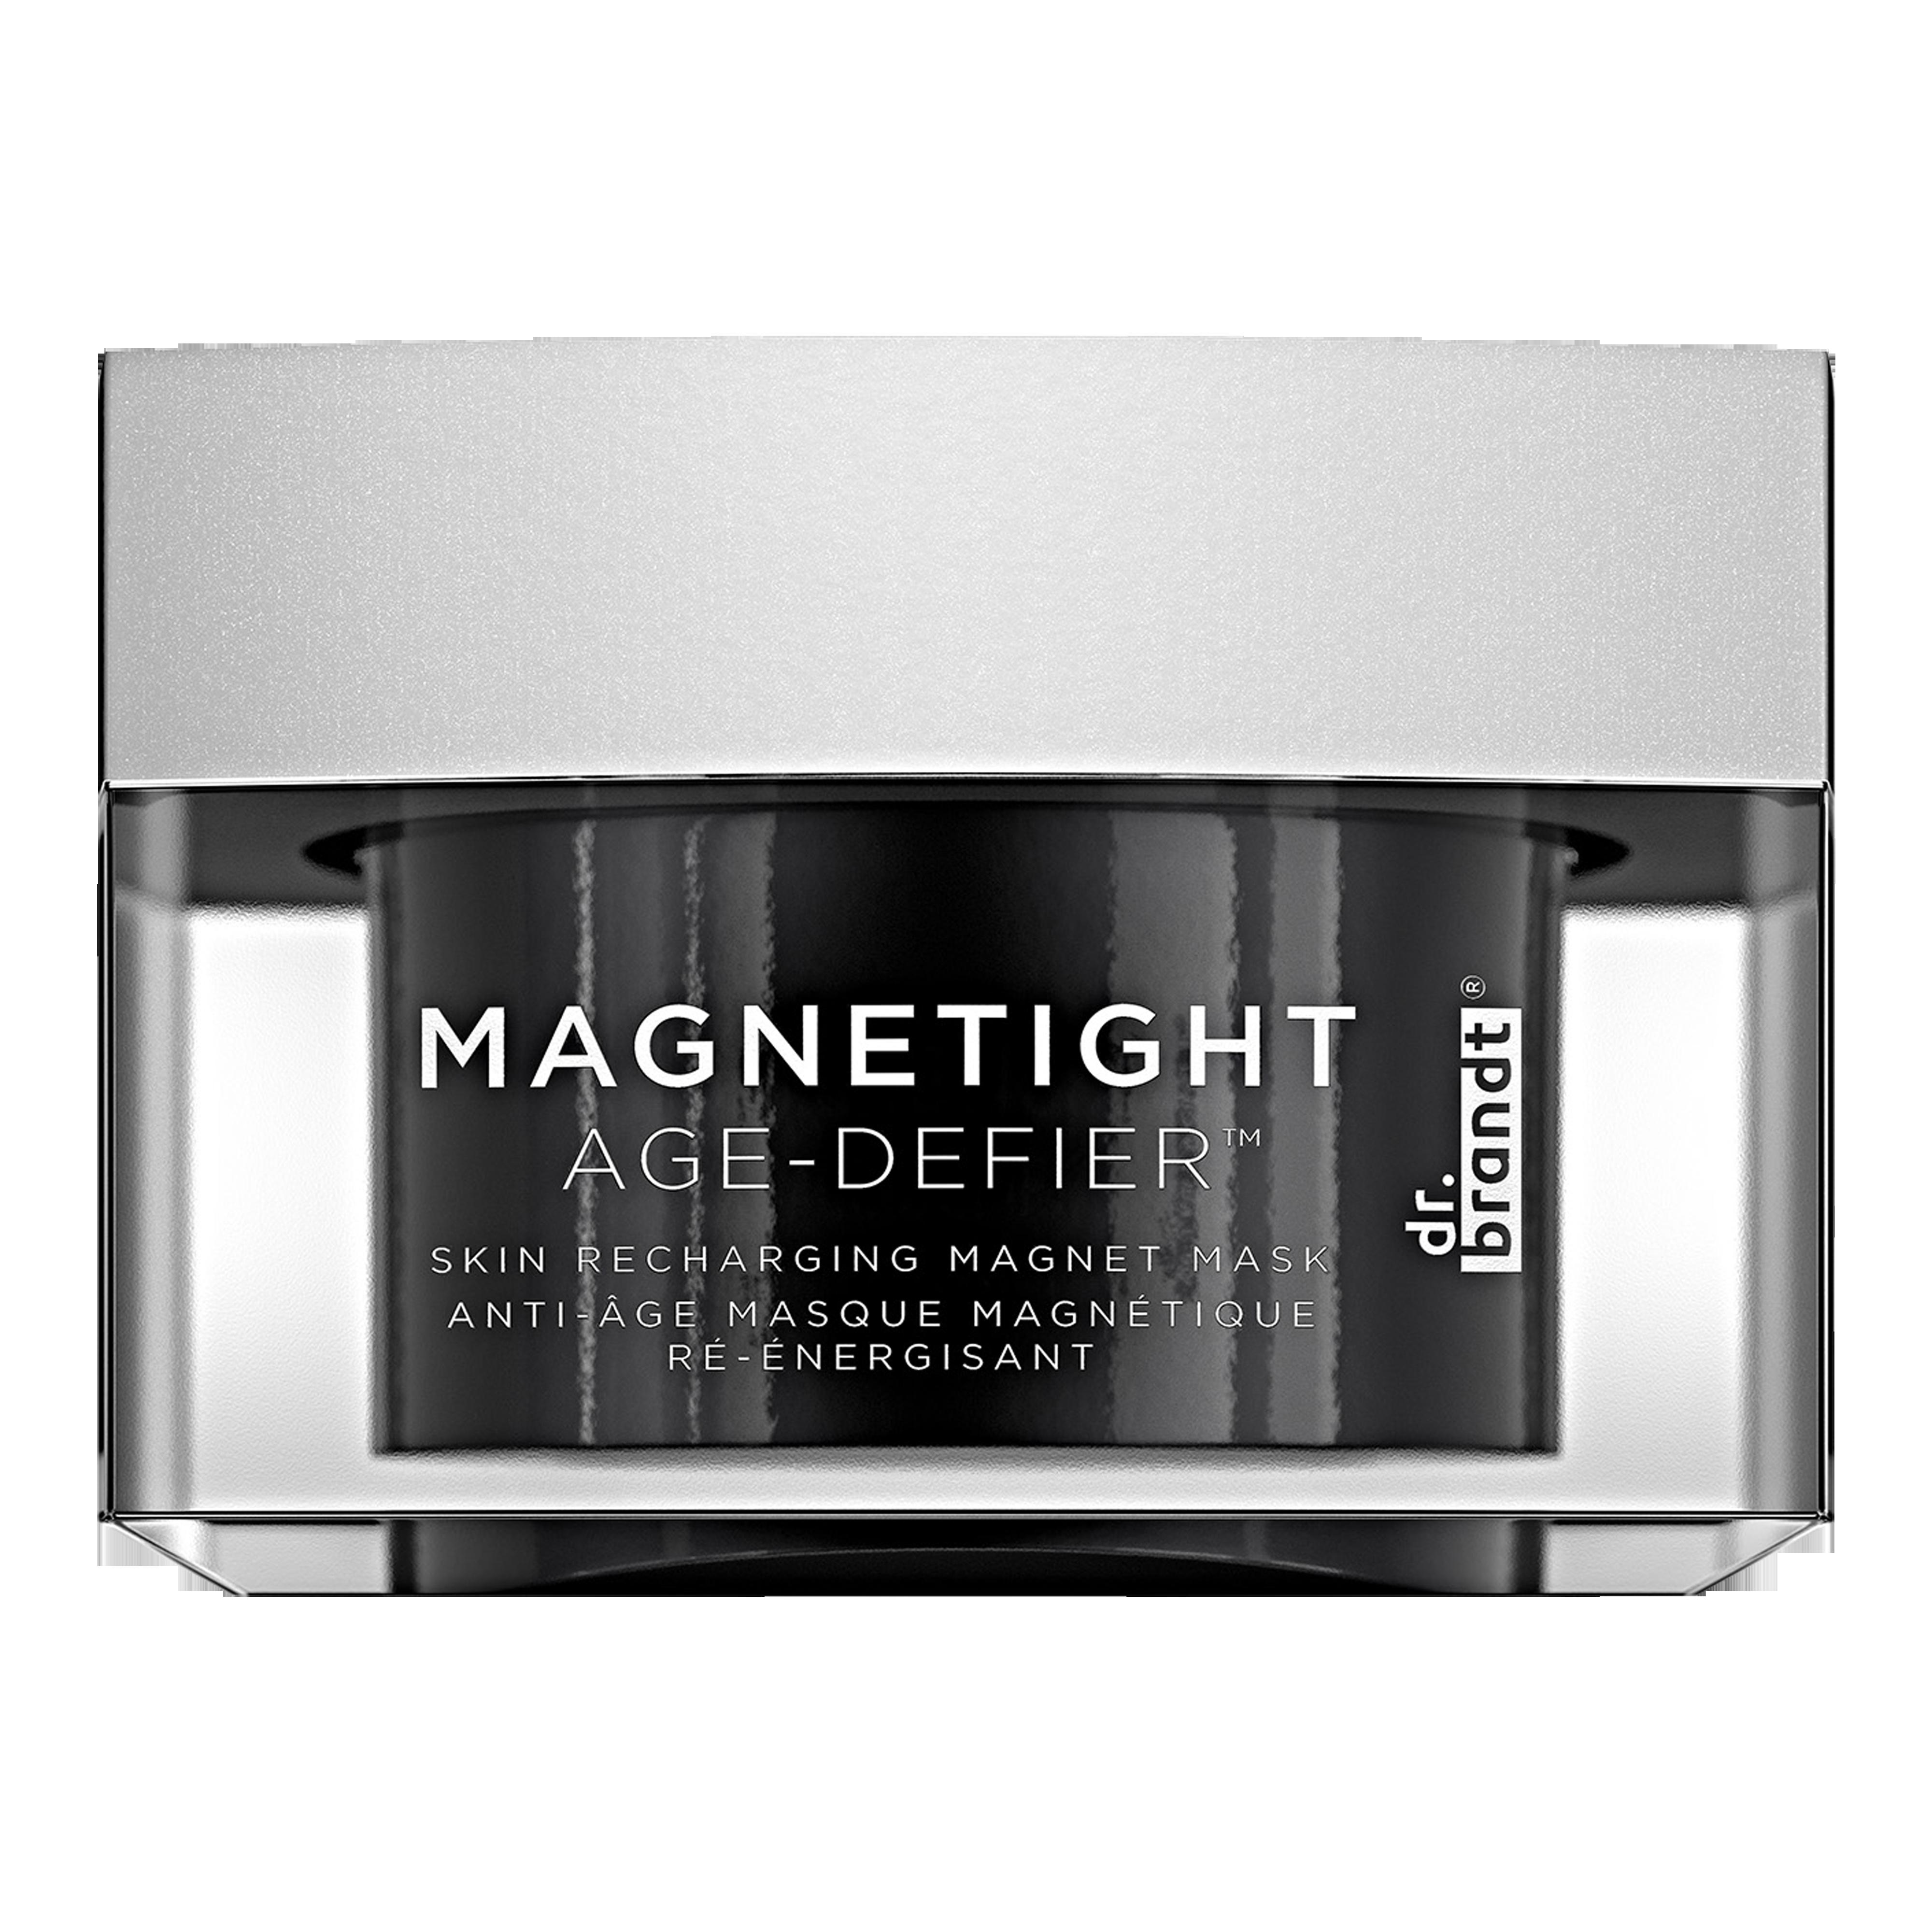 Magnetight Age Defier Mask